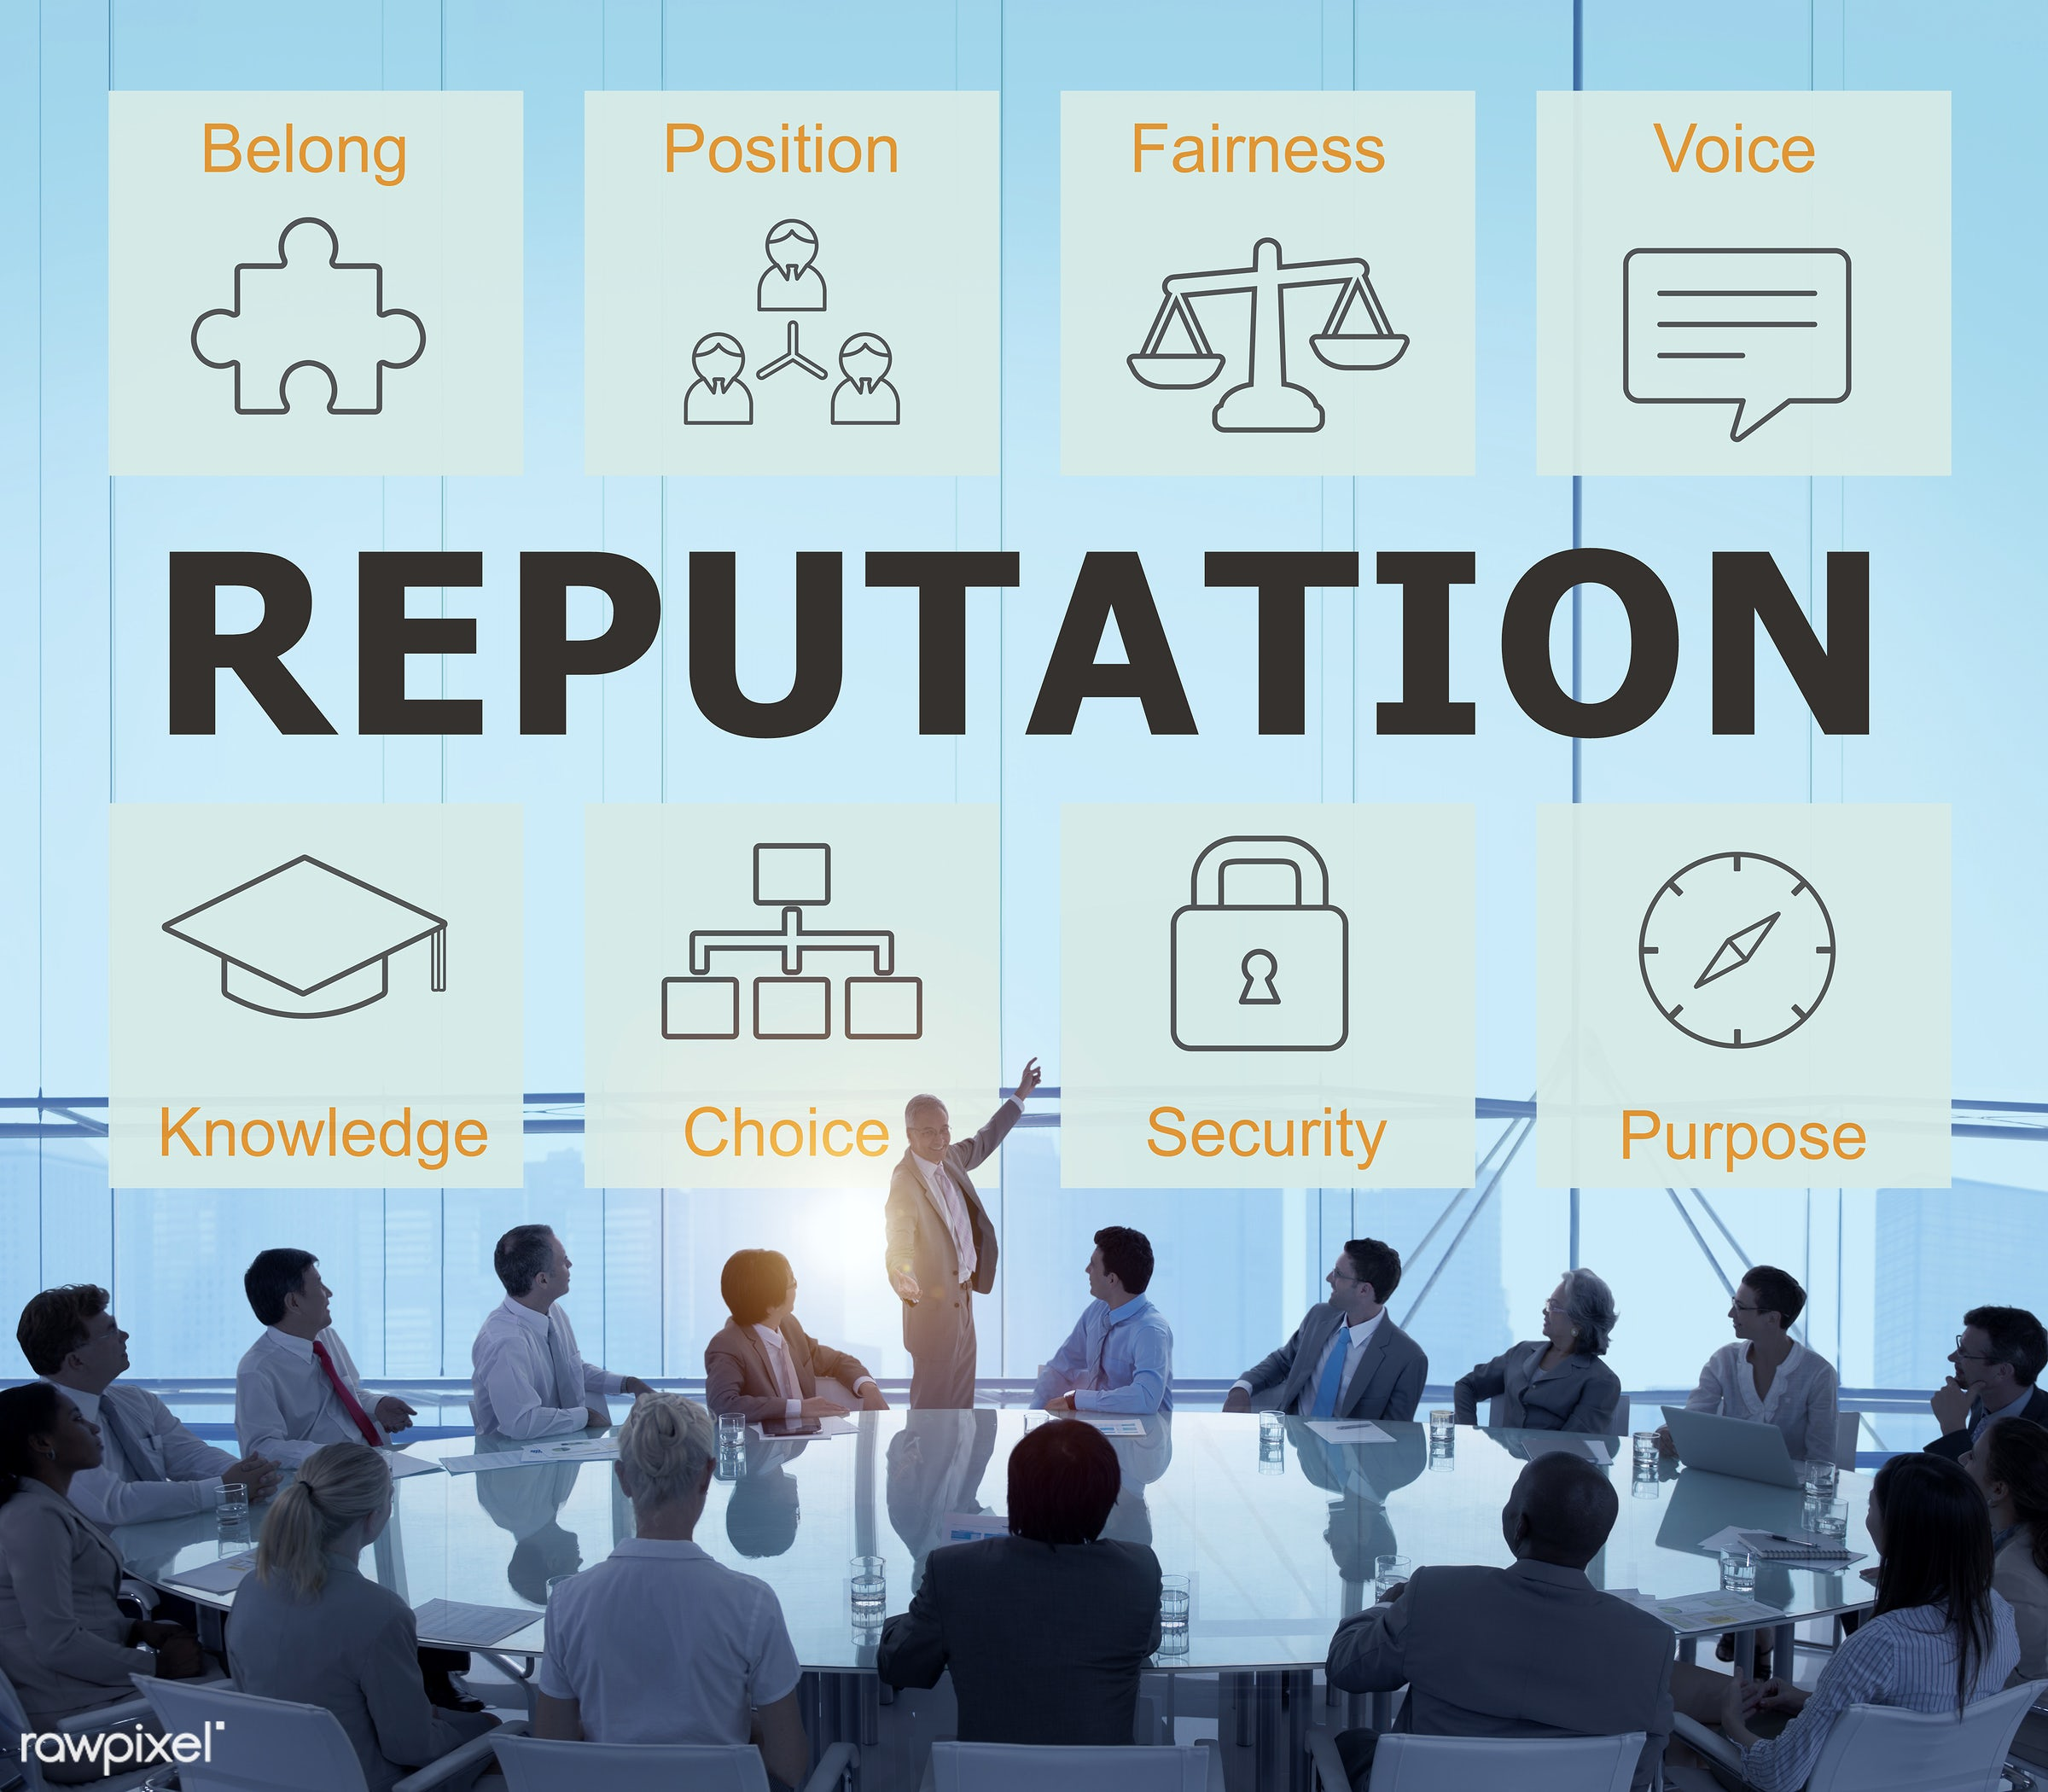 reputation, back lit, belong, brainstorming, business, business people, businessmen, businesswomen, choice, cityscape,...